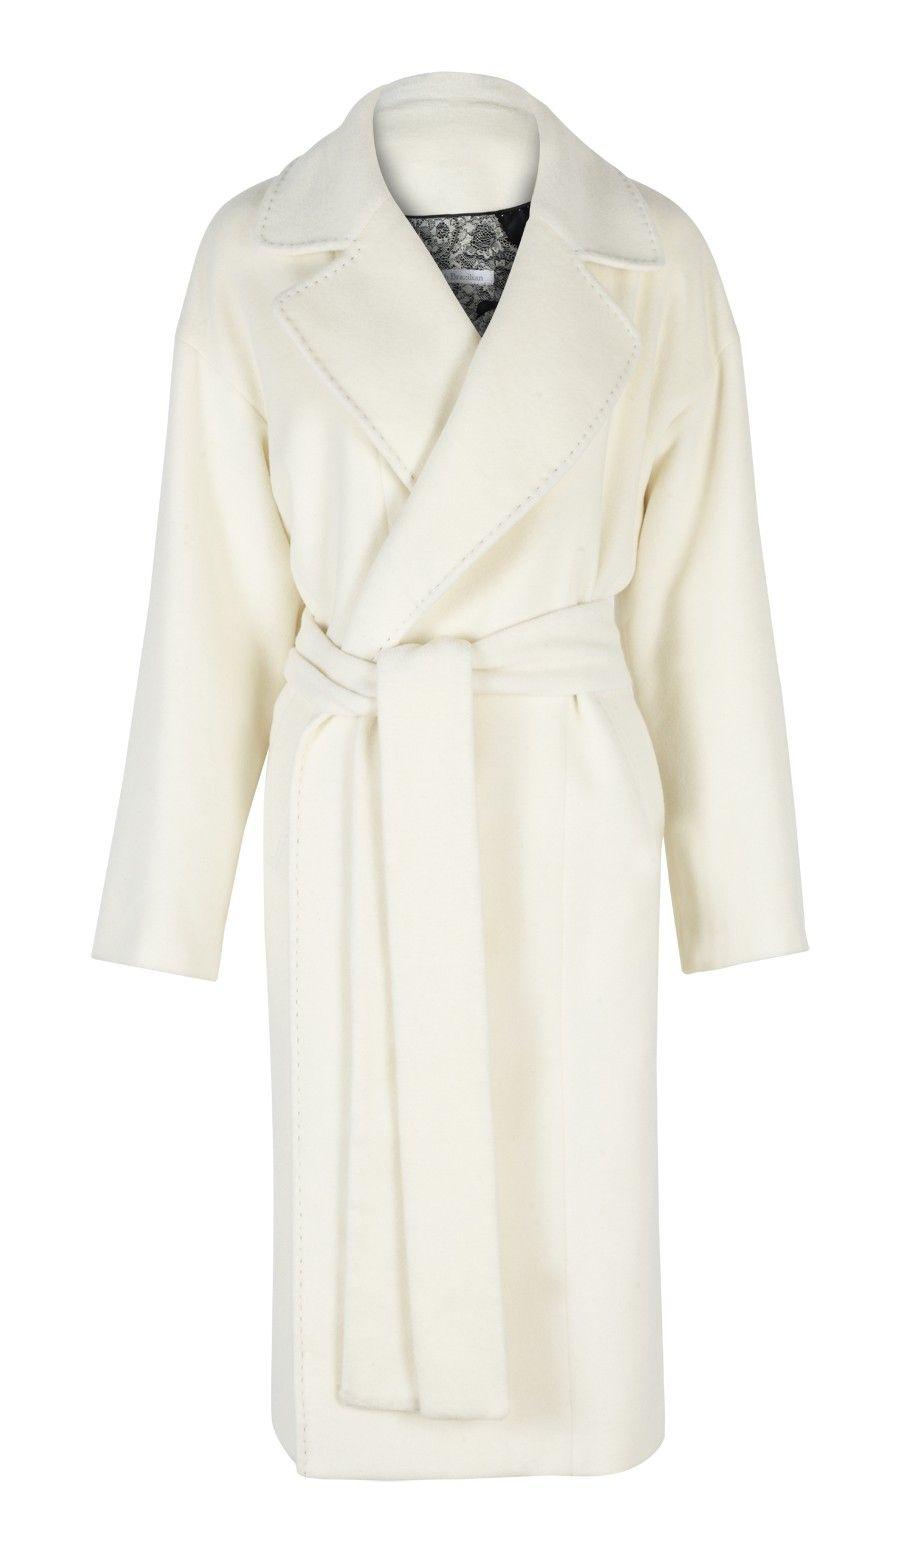 Winter White Cashmere Coat | Down Coat